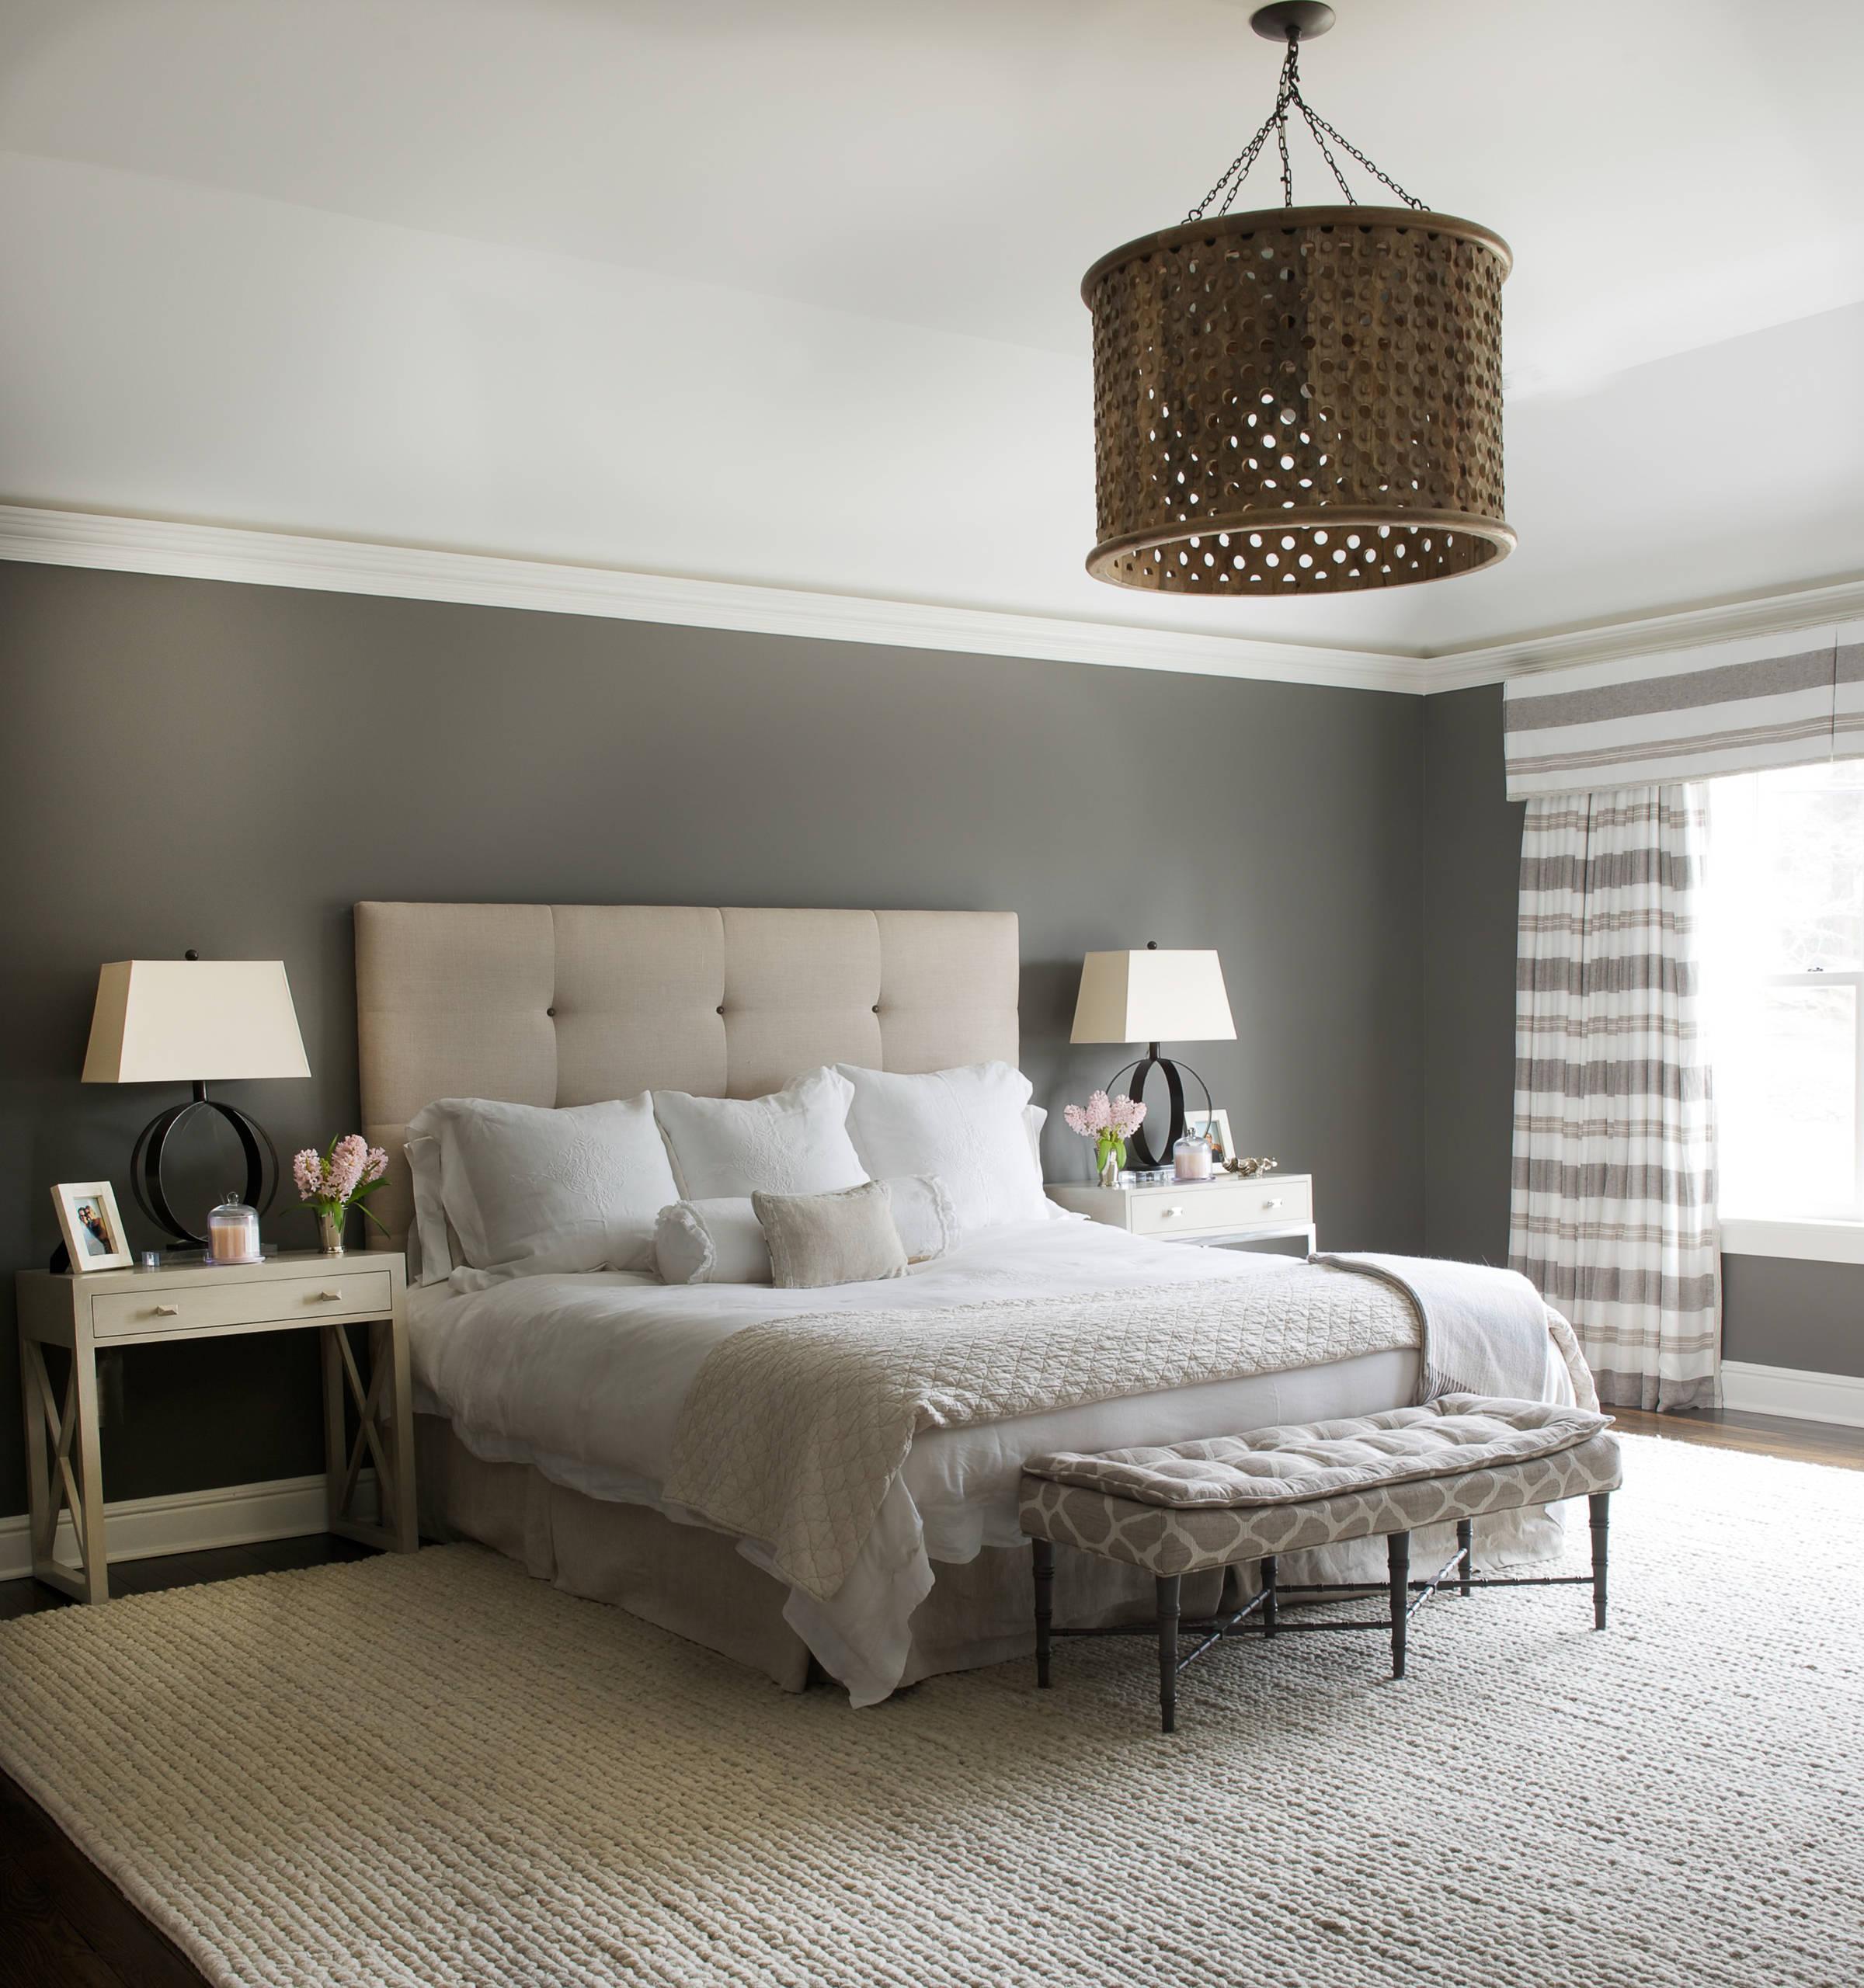 75 Beautiful Transitional Dark Wood Floor Bedroom Pictures Ideas February 2021 Houzz